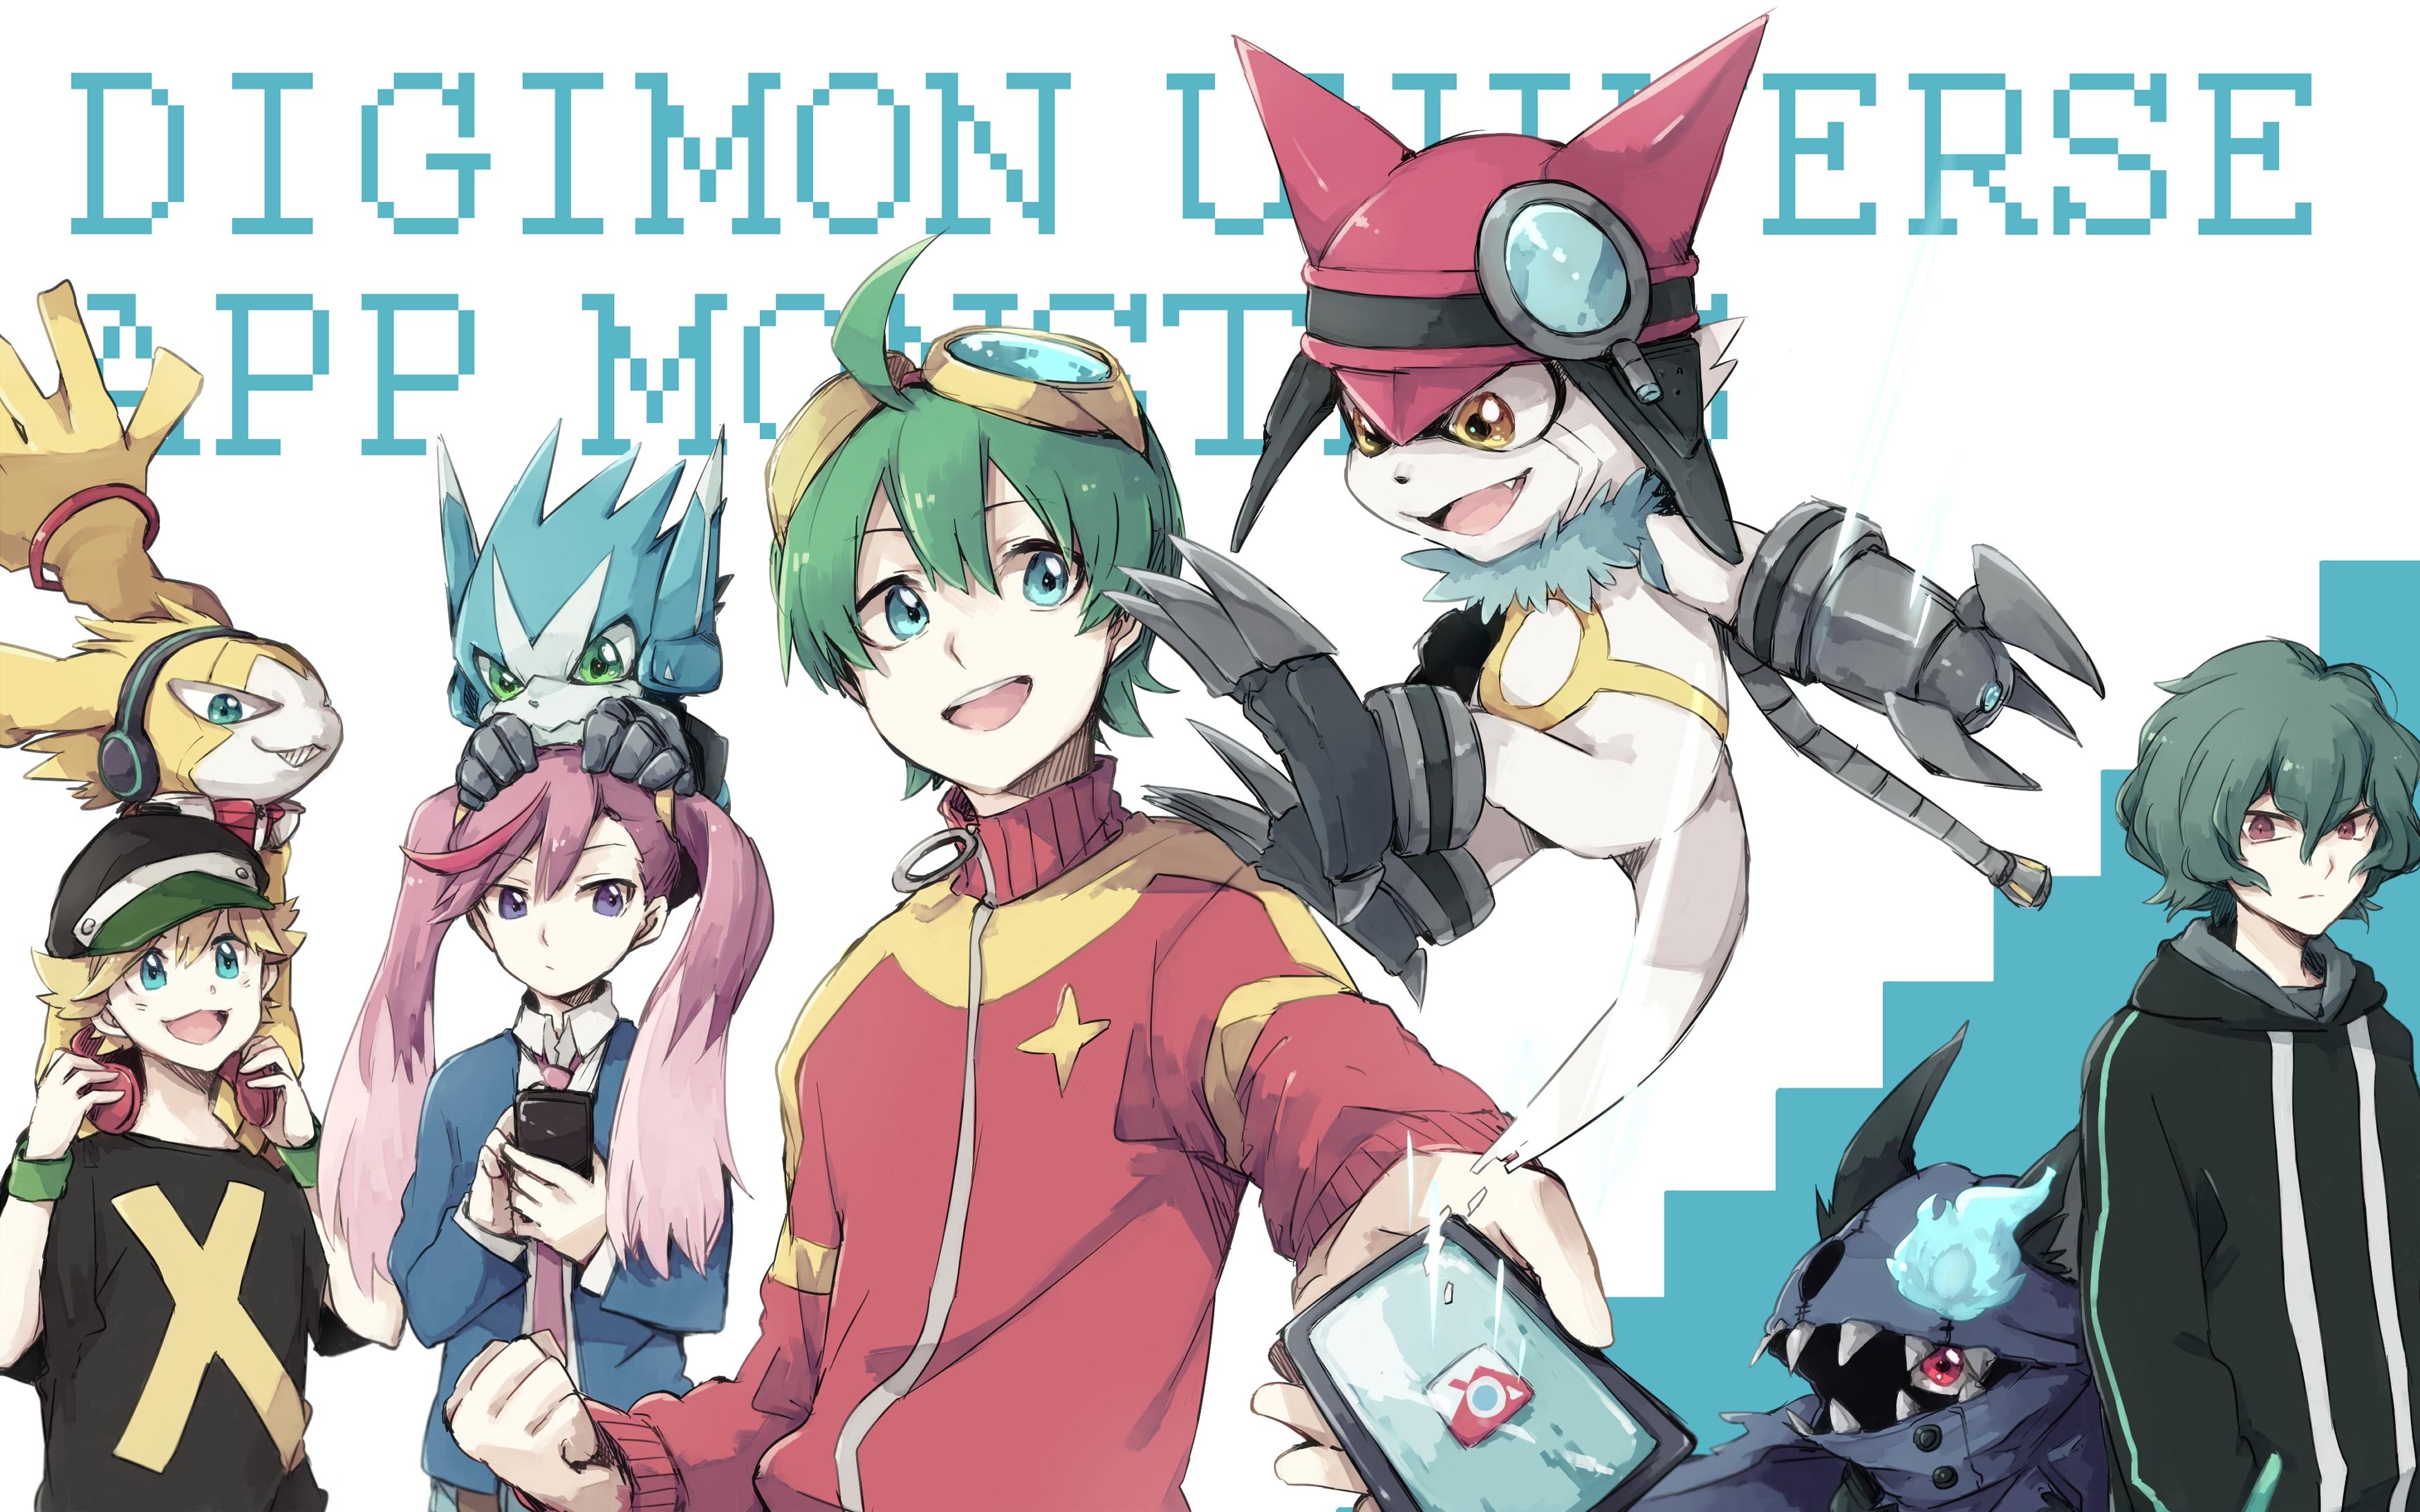 Digimon Universe: Appli Monsters – νέα και στιγμιότυπα